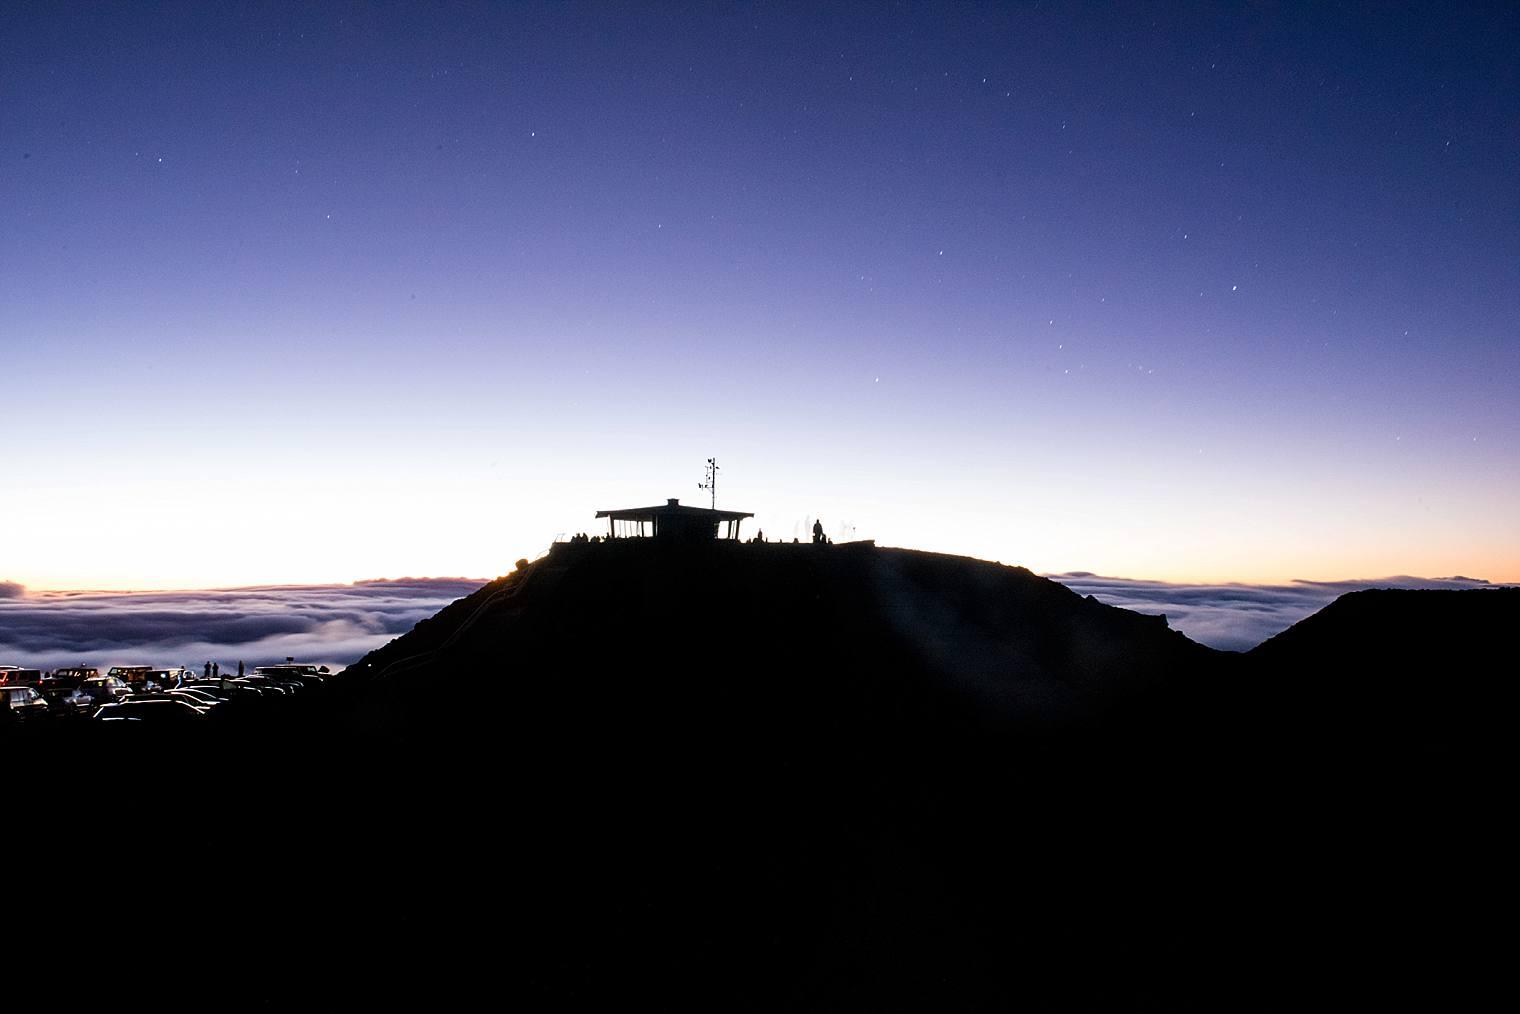 Sunrise Haleakala Proposal Photographer Maui, Hawaii_0002